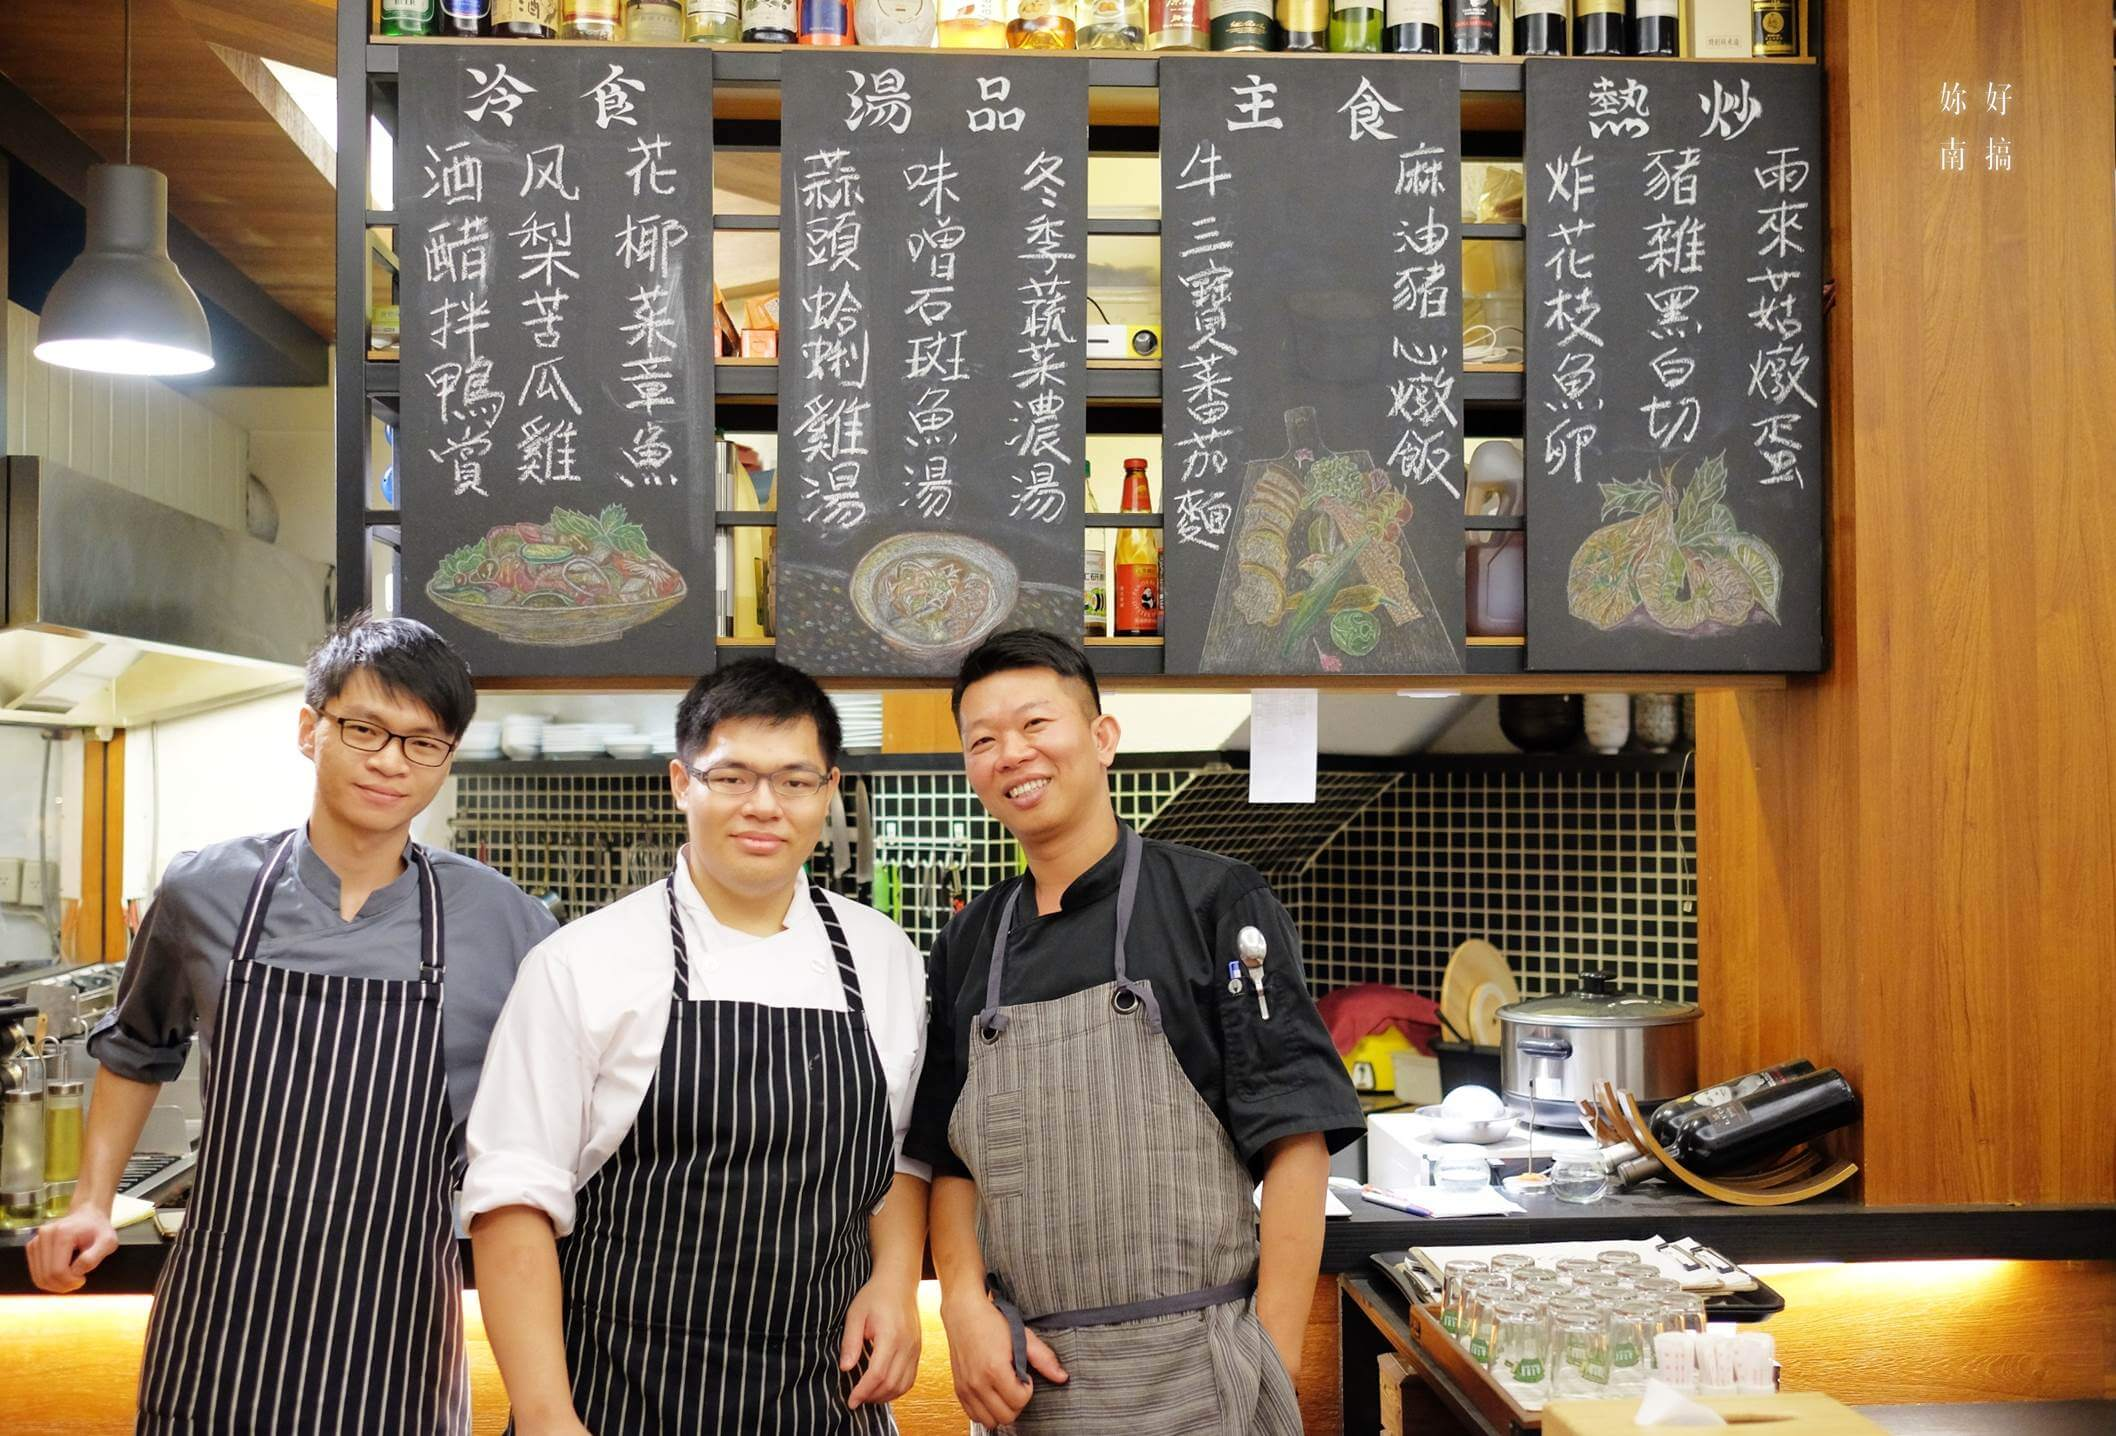 Chef Table Food & Wine故事-06-妳好南搞